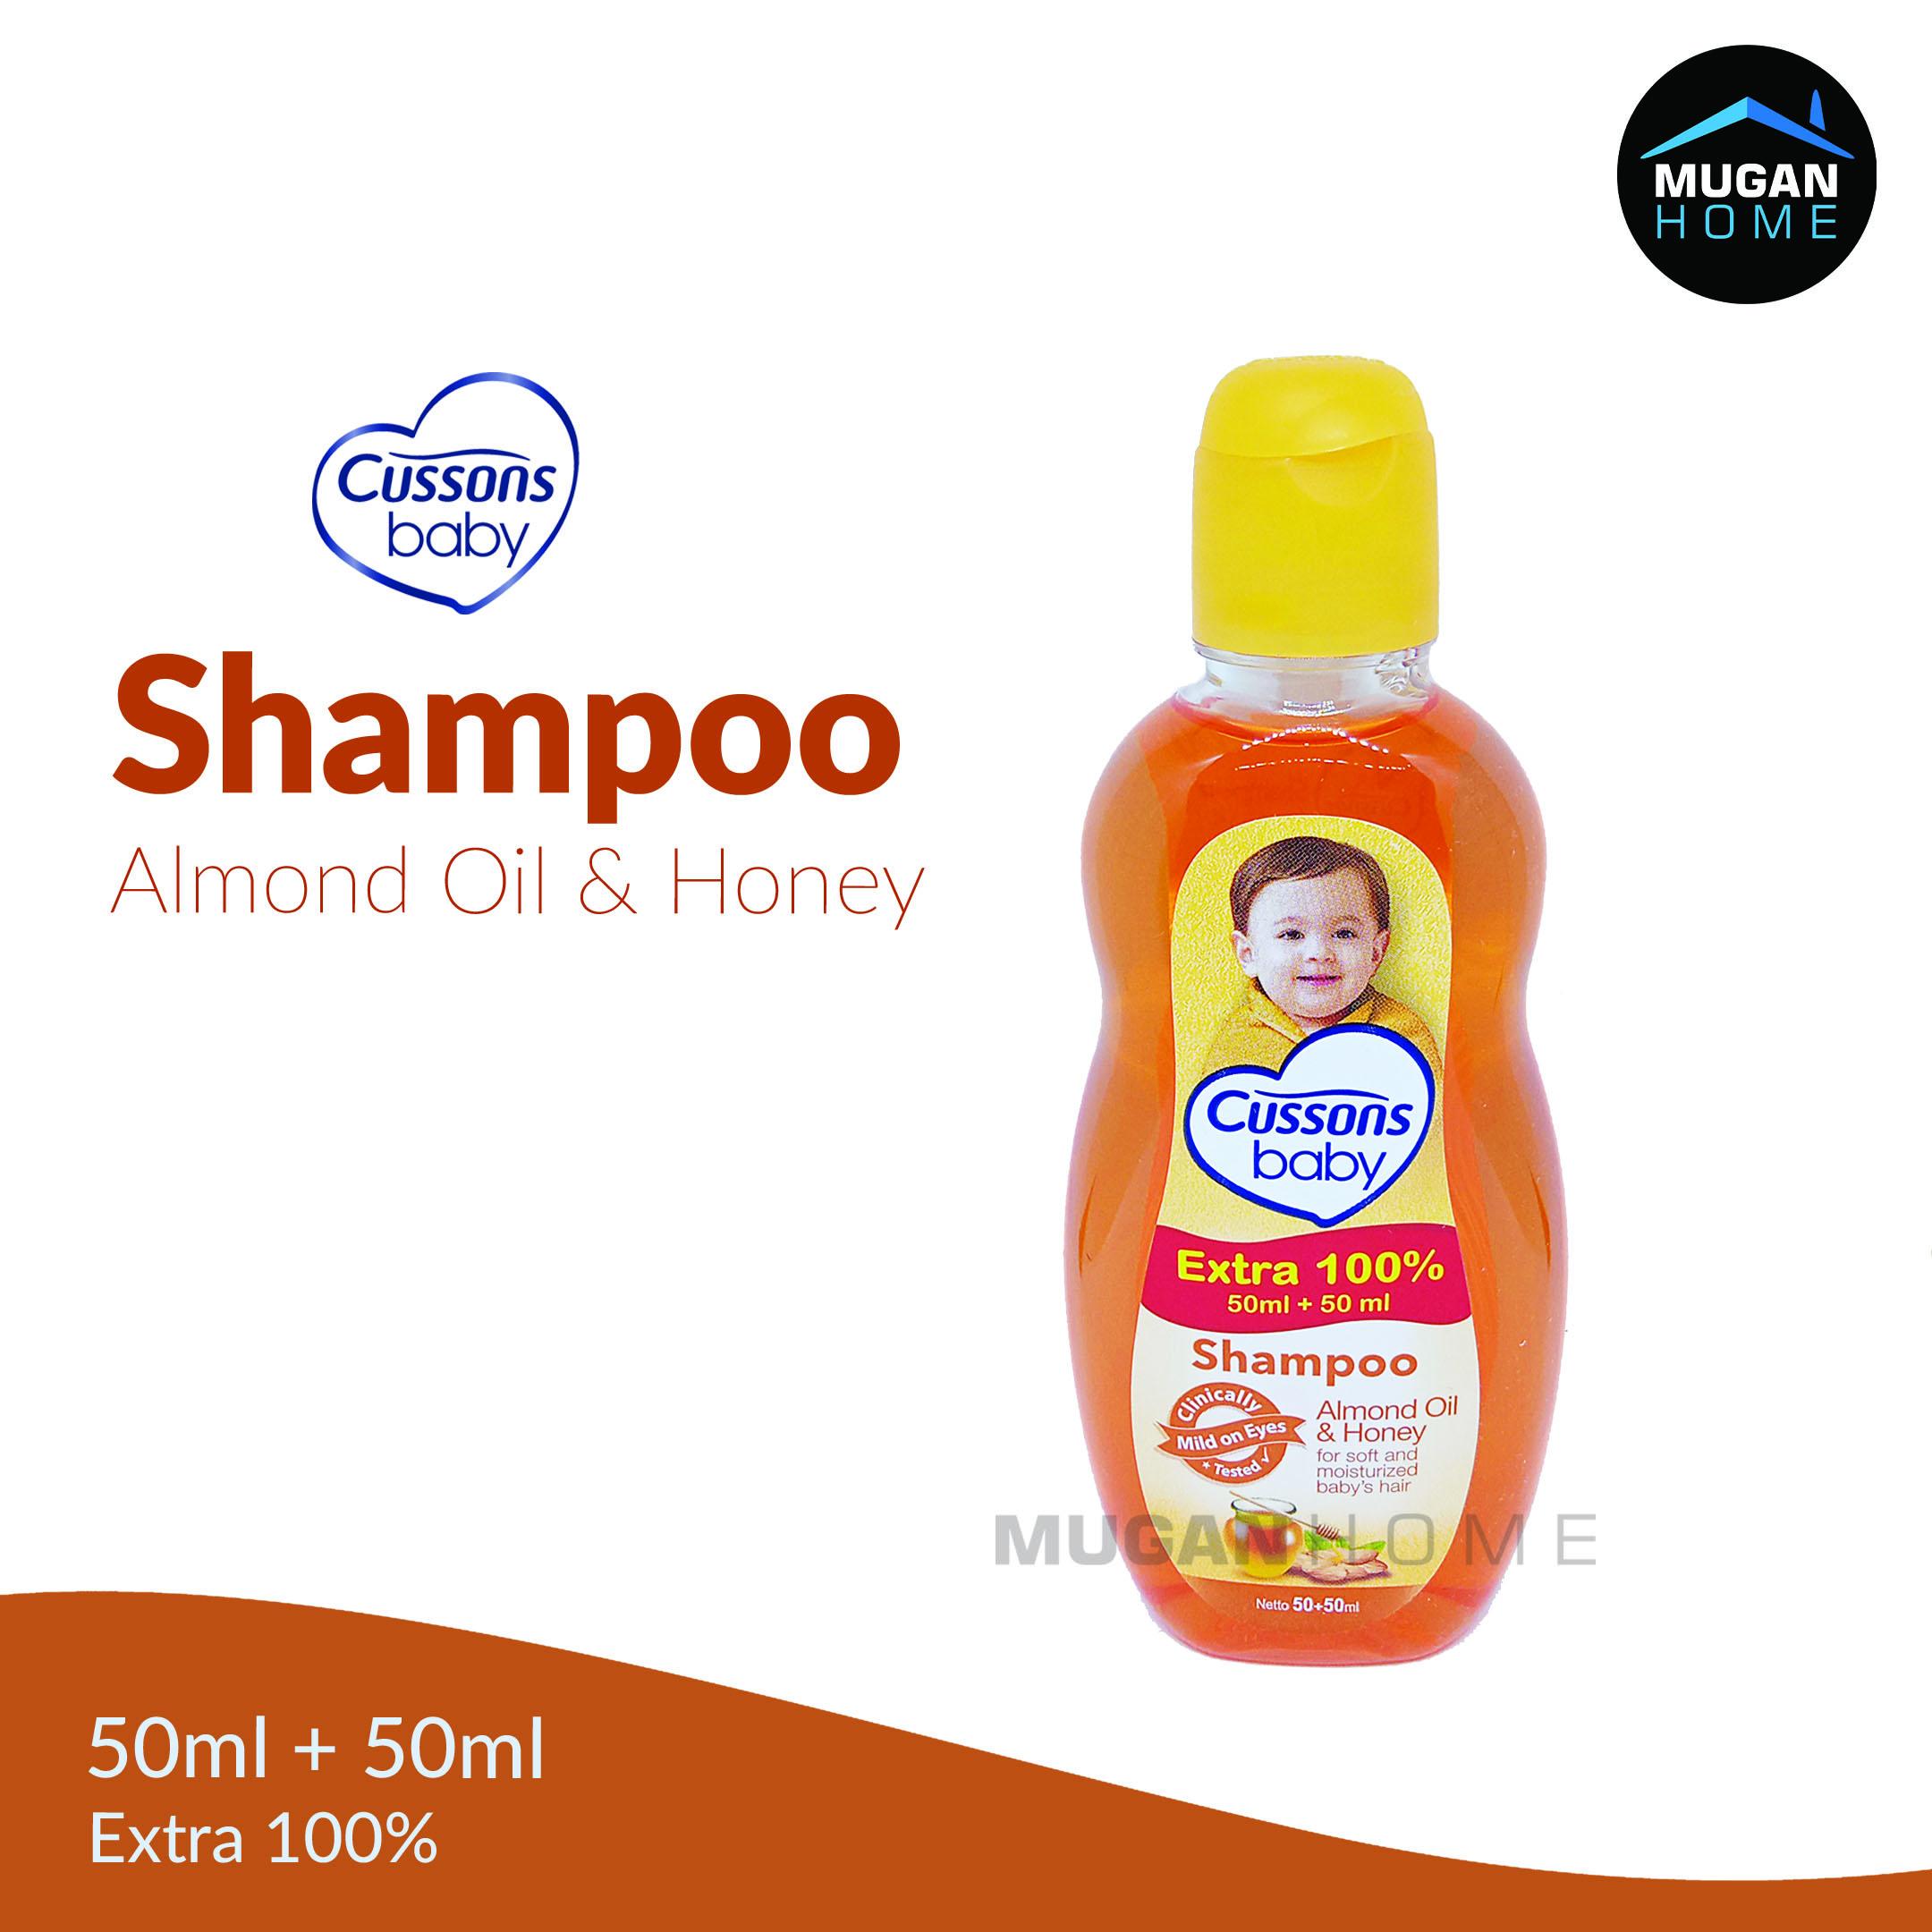 CUSSONS BABY SHAMPOO 50ML ALMOND OIL & HONEY EXTRA 100% 50ML